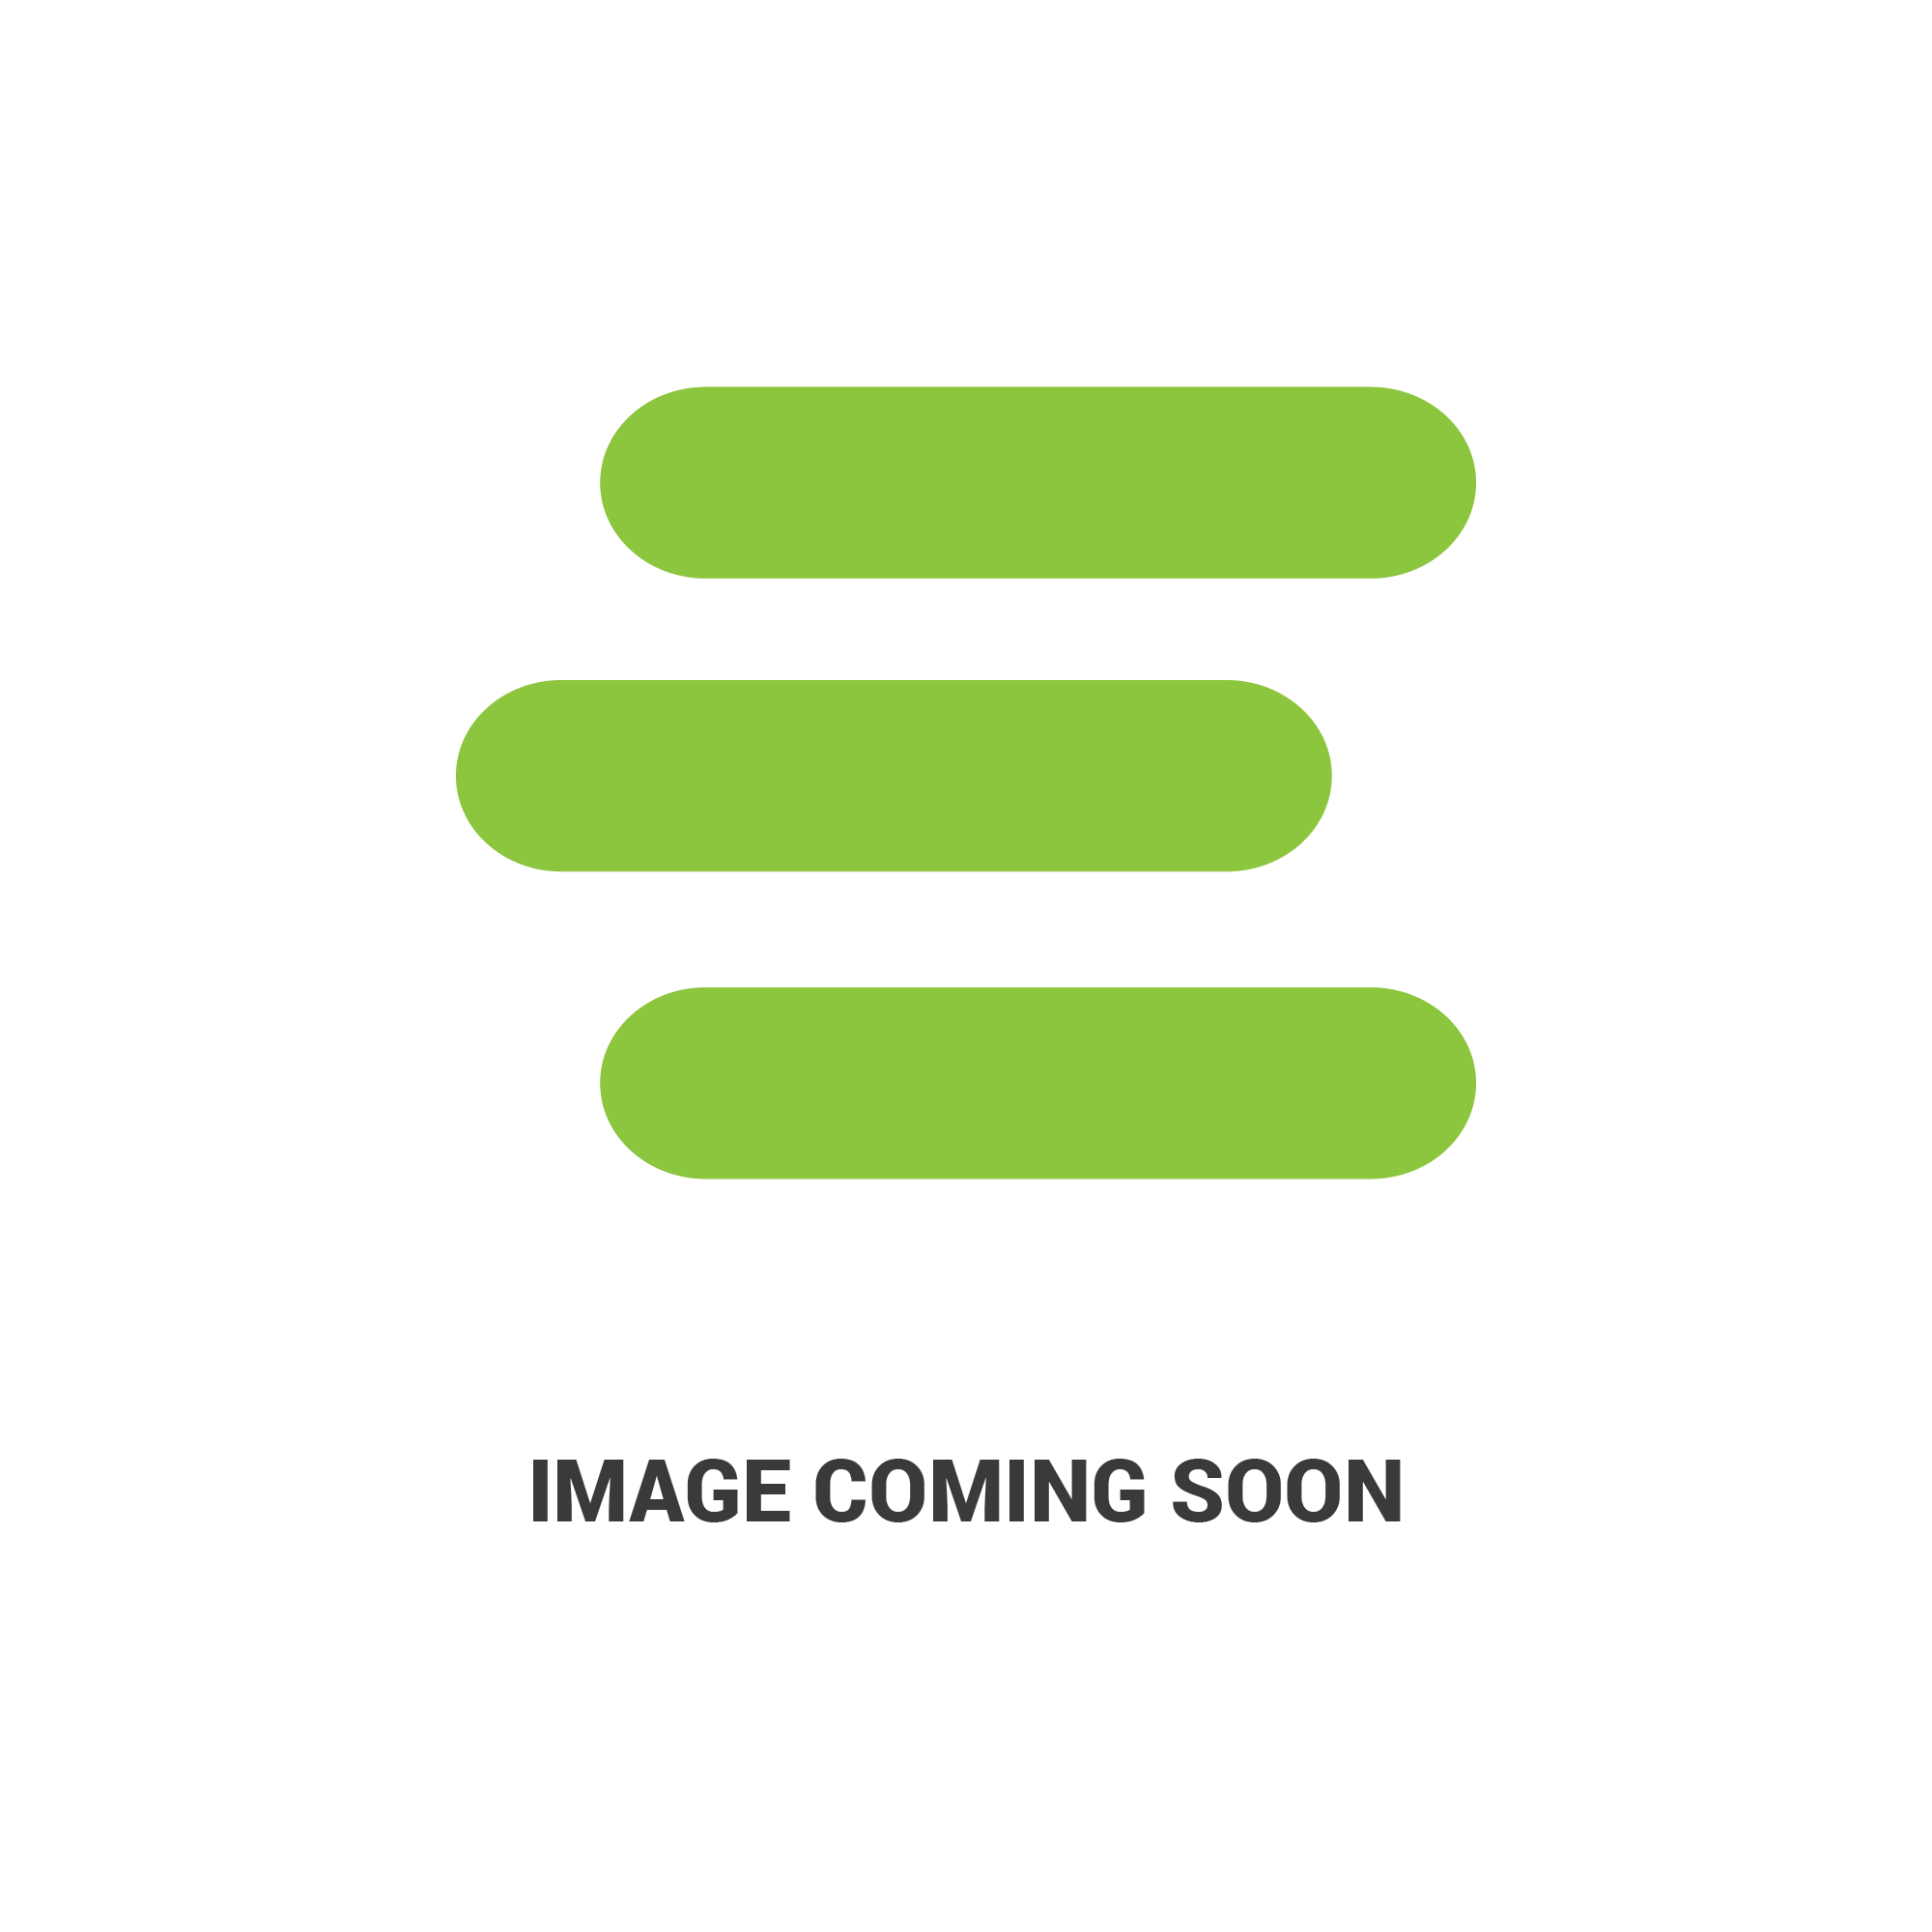 E-K3001-56010edit 1246.jpg